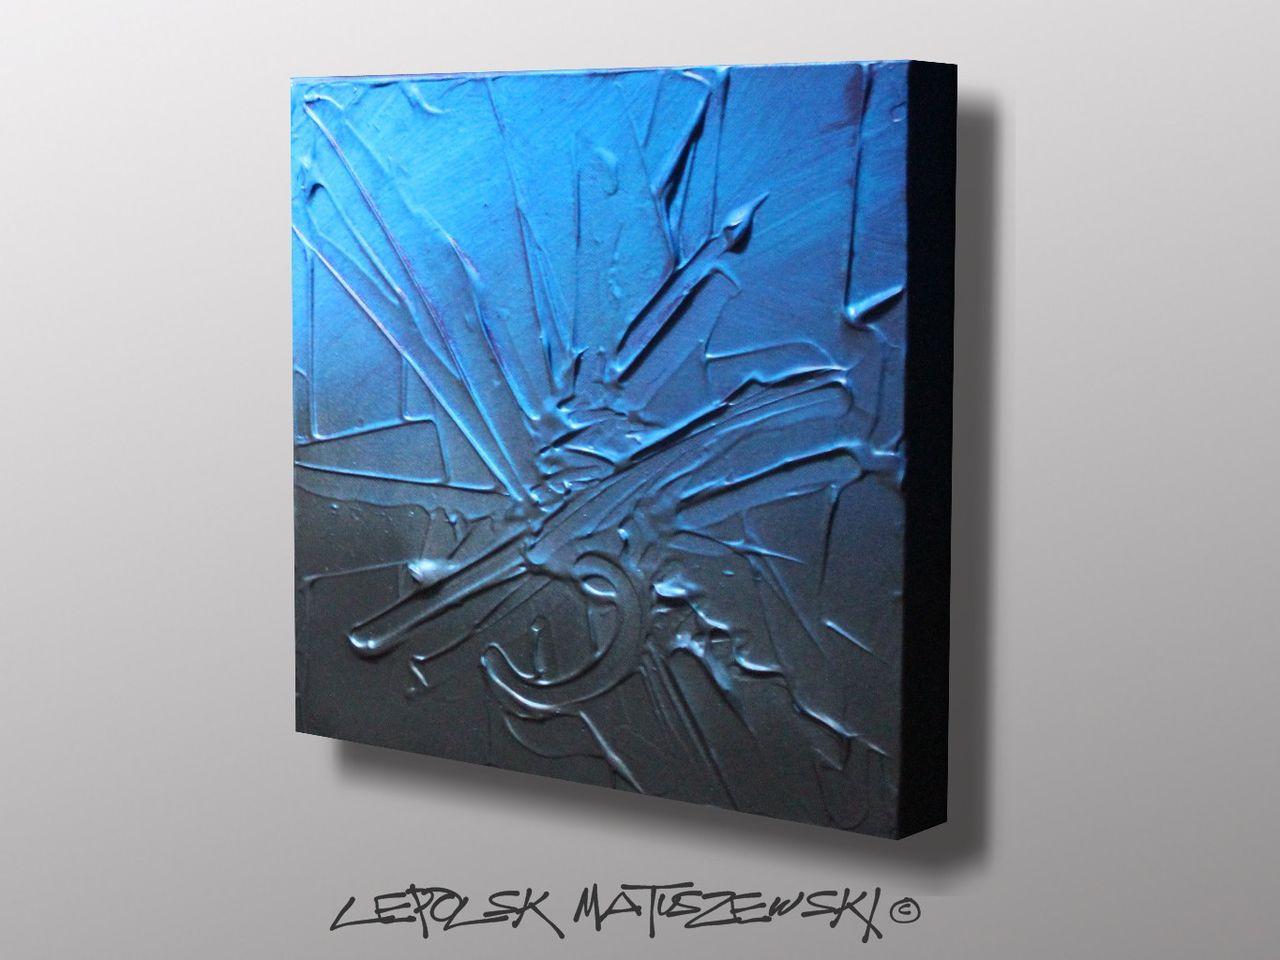 MK  Lepolsk Matuszewski LAGON    Lepolsk matuszewski abstract